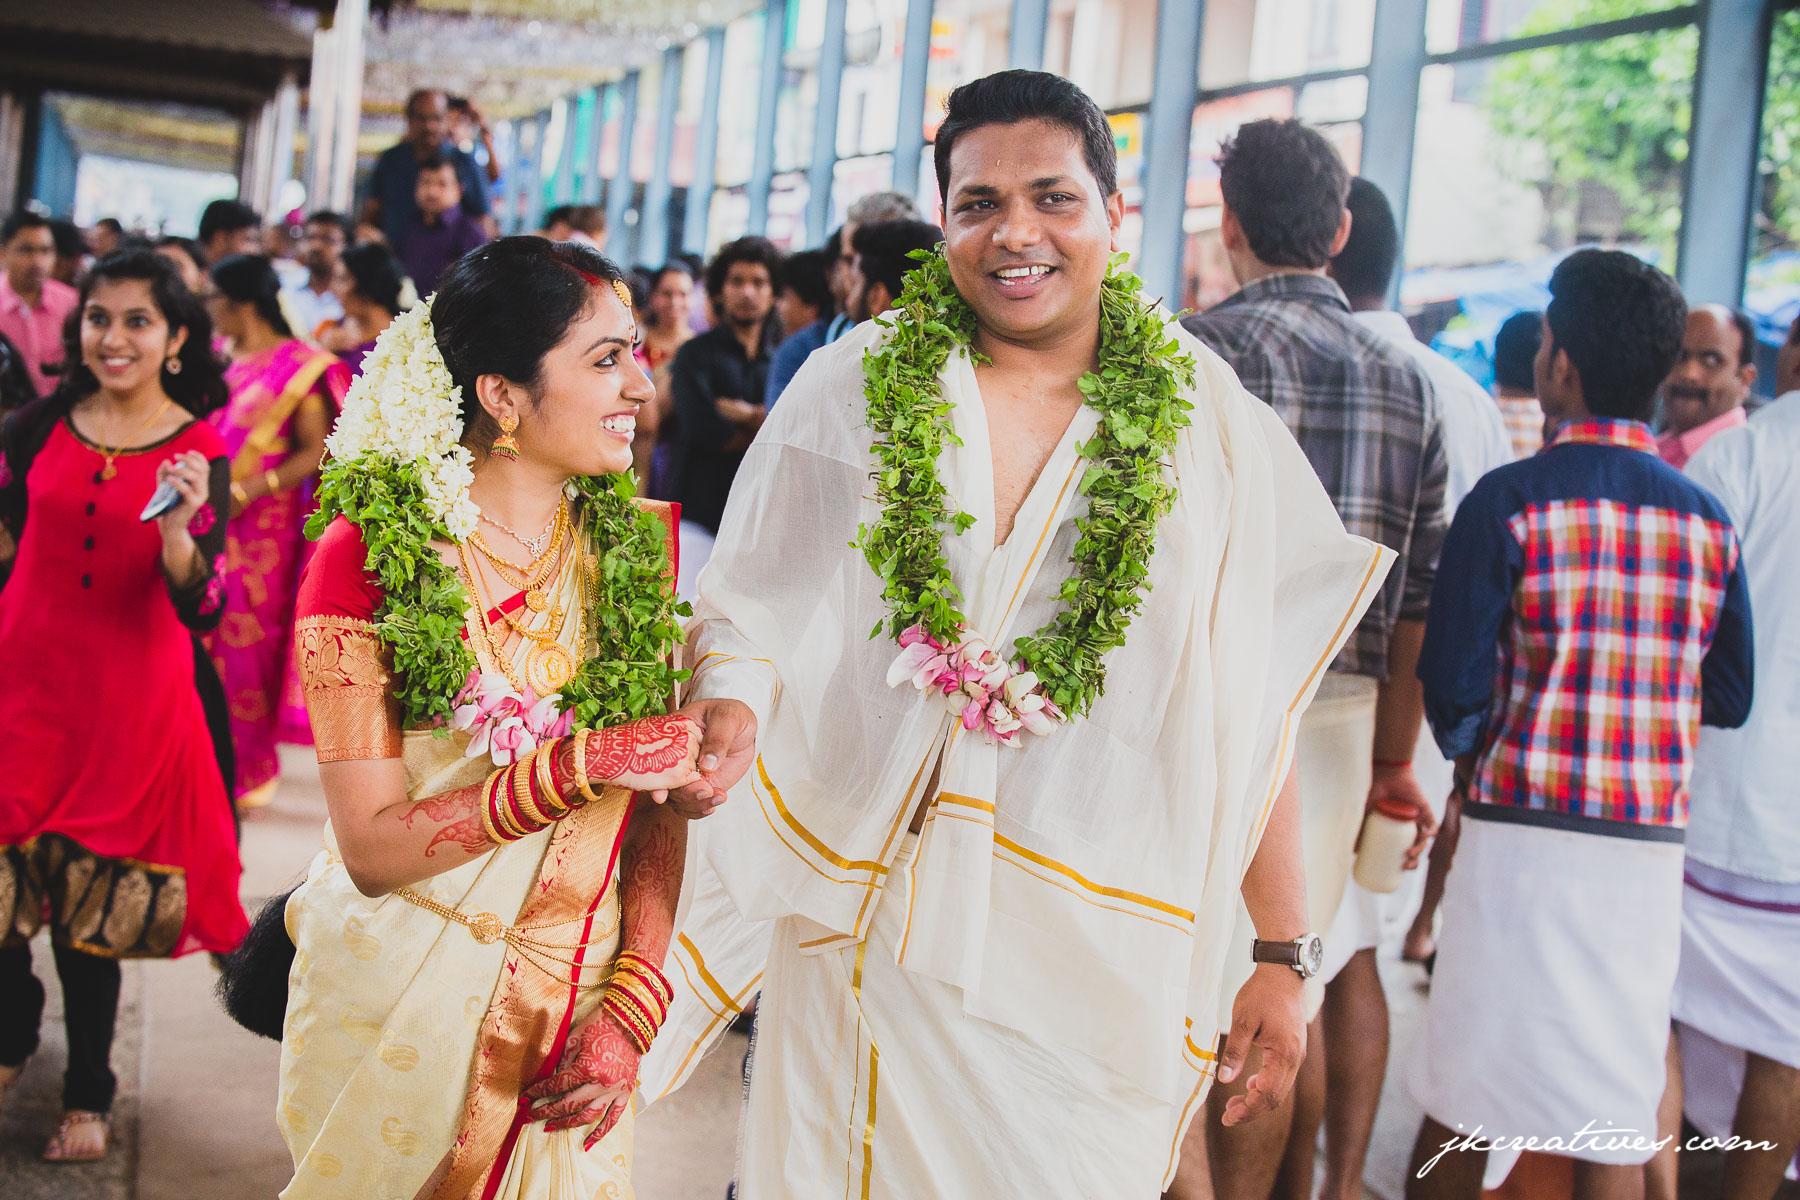 Arun & Manju - Kerala Hindu Wedding at Guruvayoor Temple - Candid Wedding Photography by Best Candid Wedding Photographer_Coimbatore, Chennai, Bangalore, Tamil Nadu, Hyderabad,Kerala